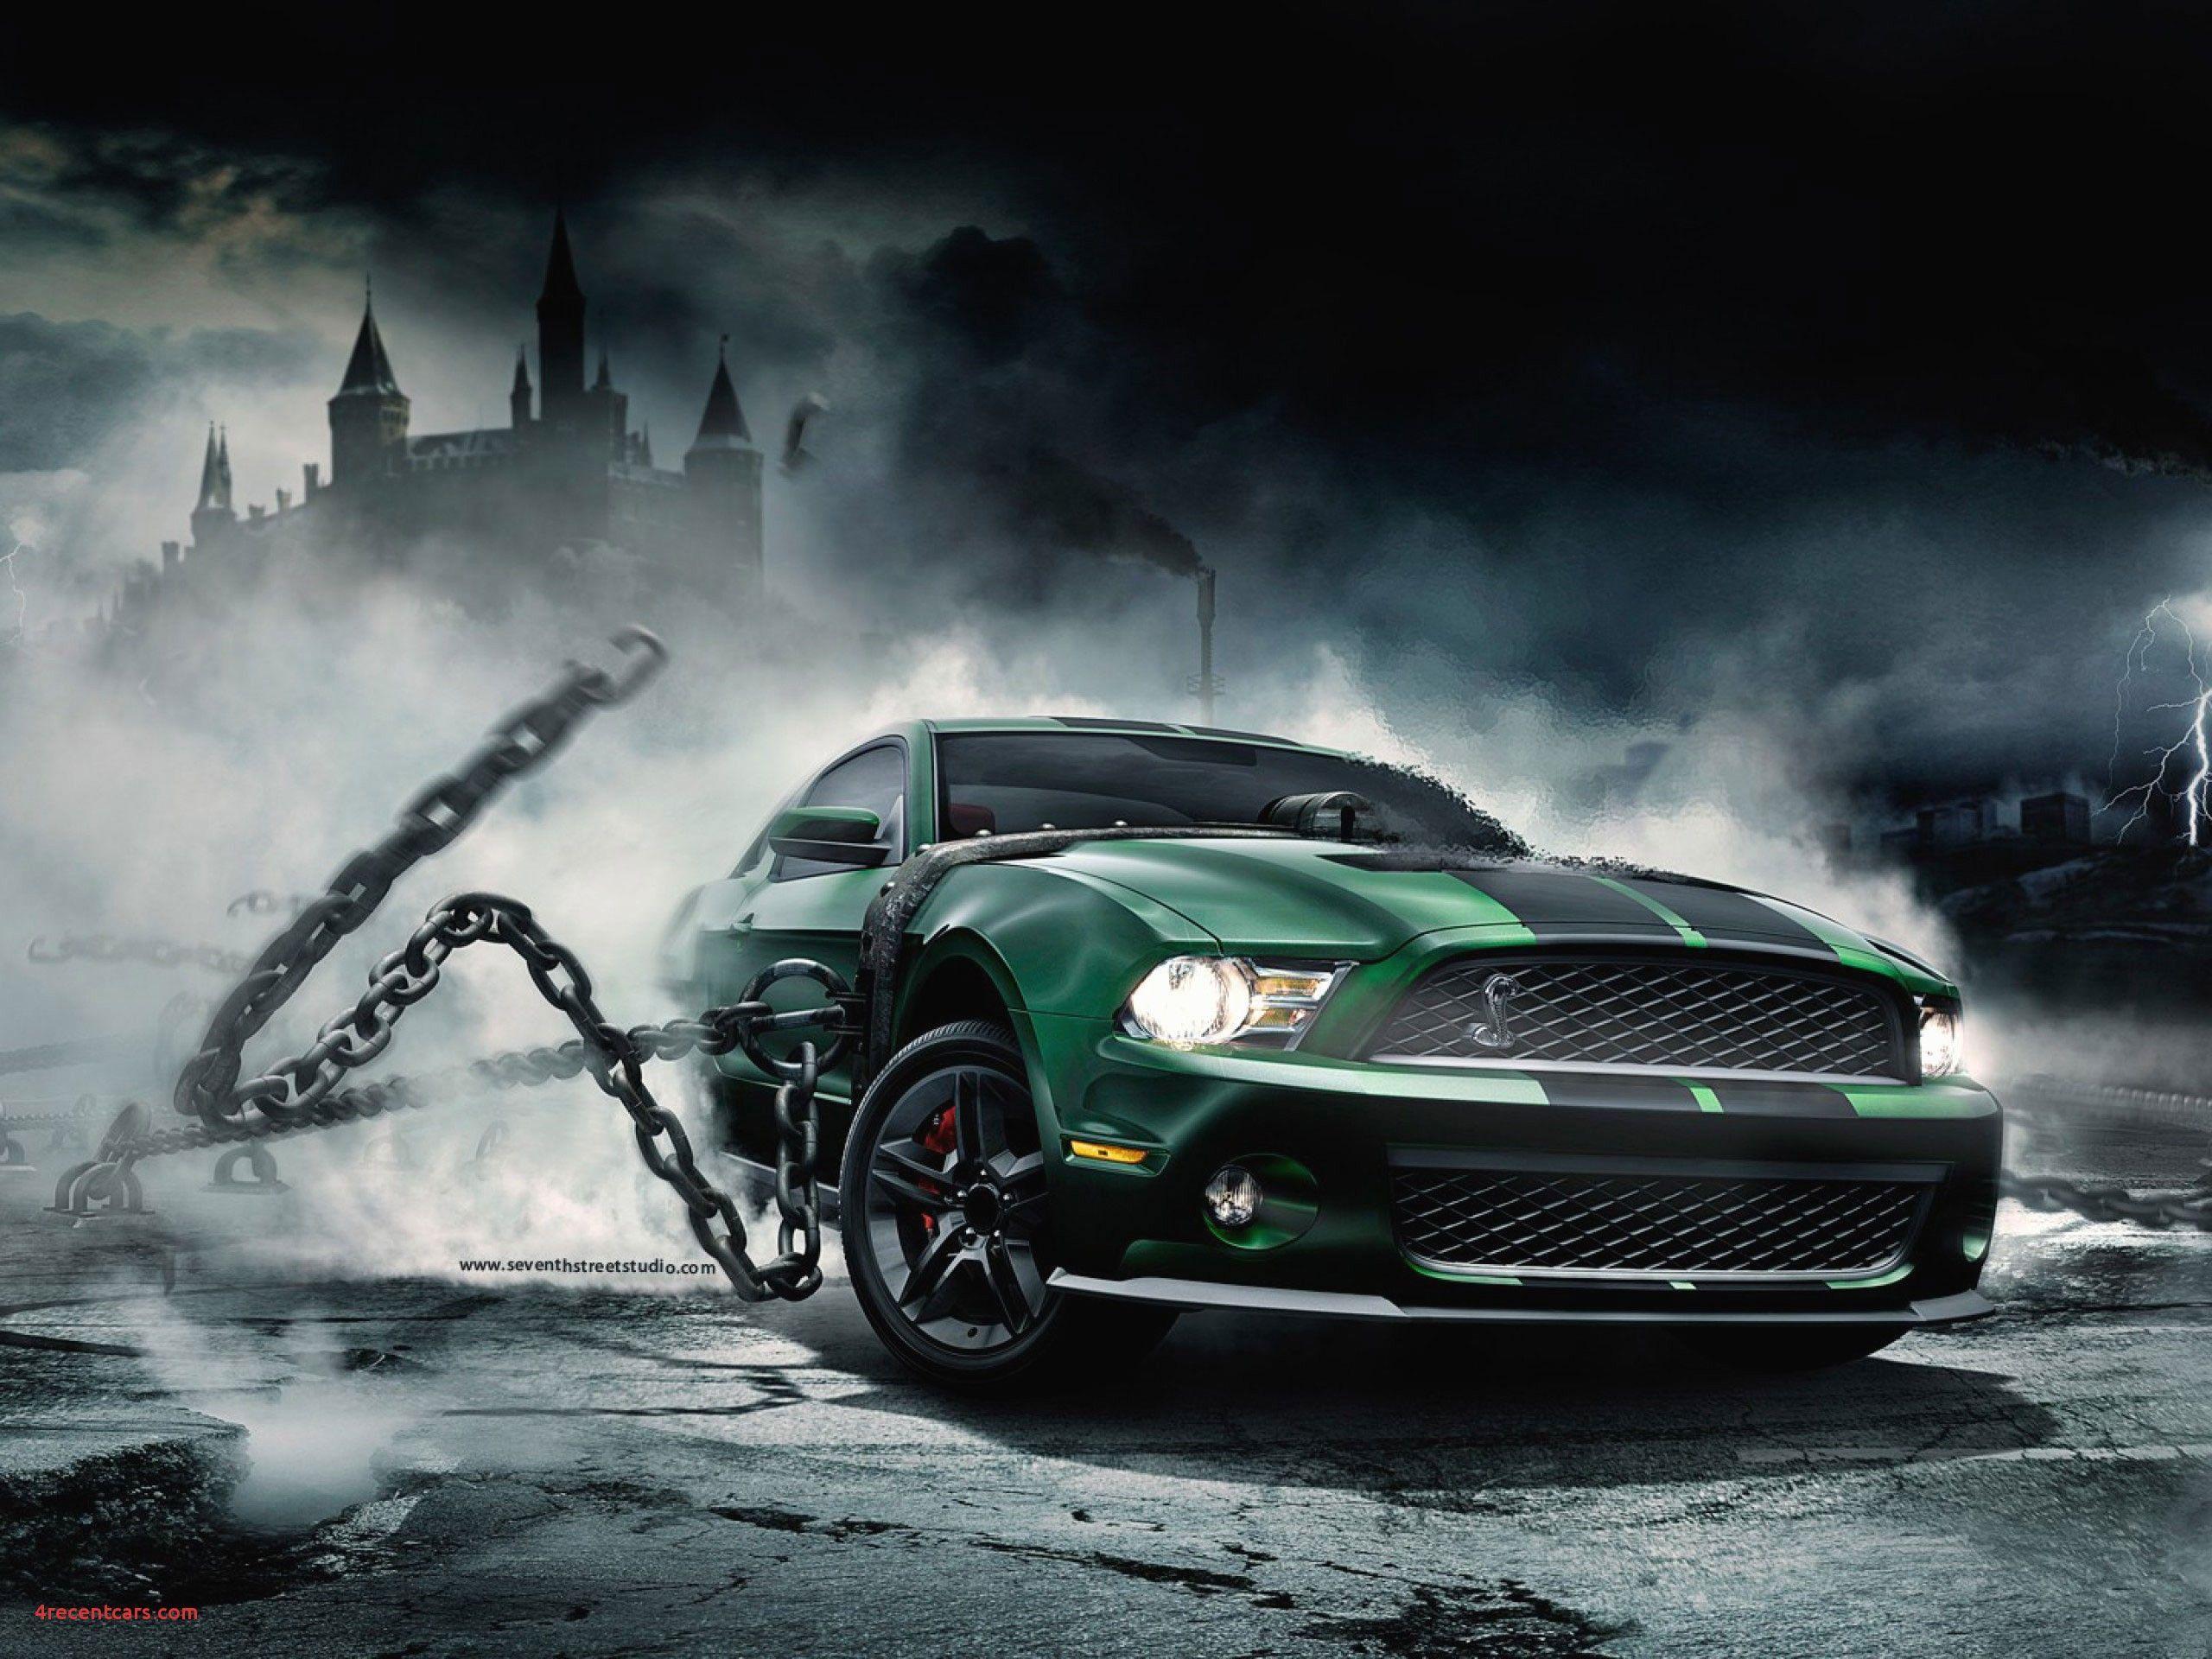 Best Hd Wallpapers Cool Cars 3d Hd Pics Mojmalnews Com Of Cars Hd Coolhdpics Wallpaper Pc Mustang Car Wallpapers